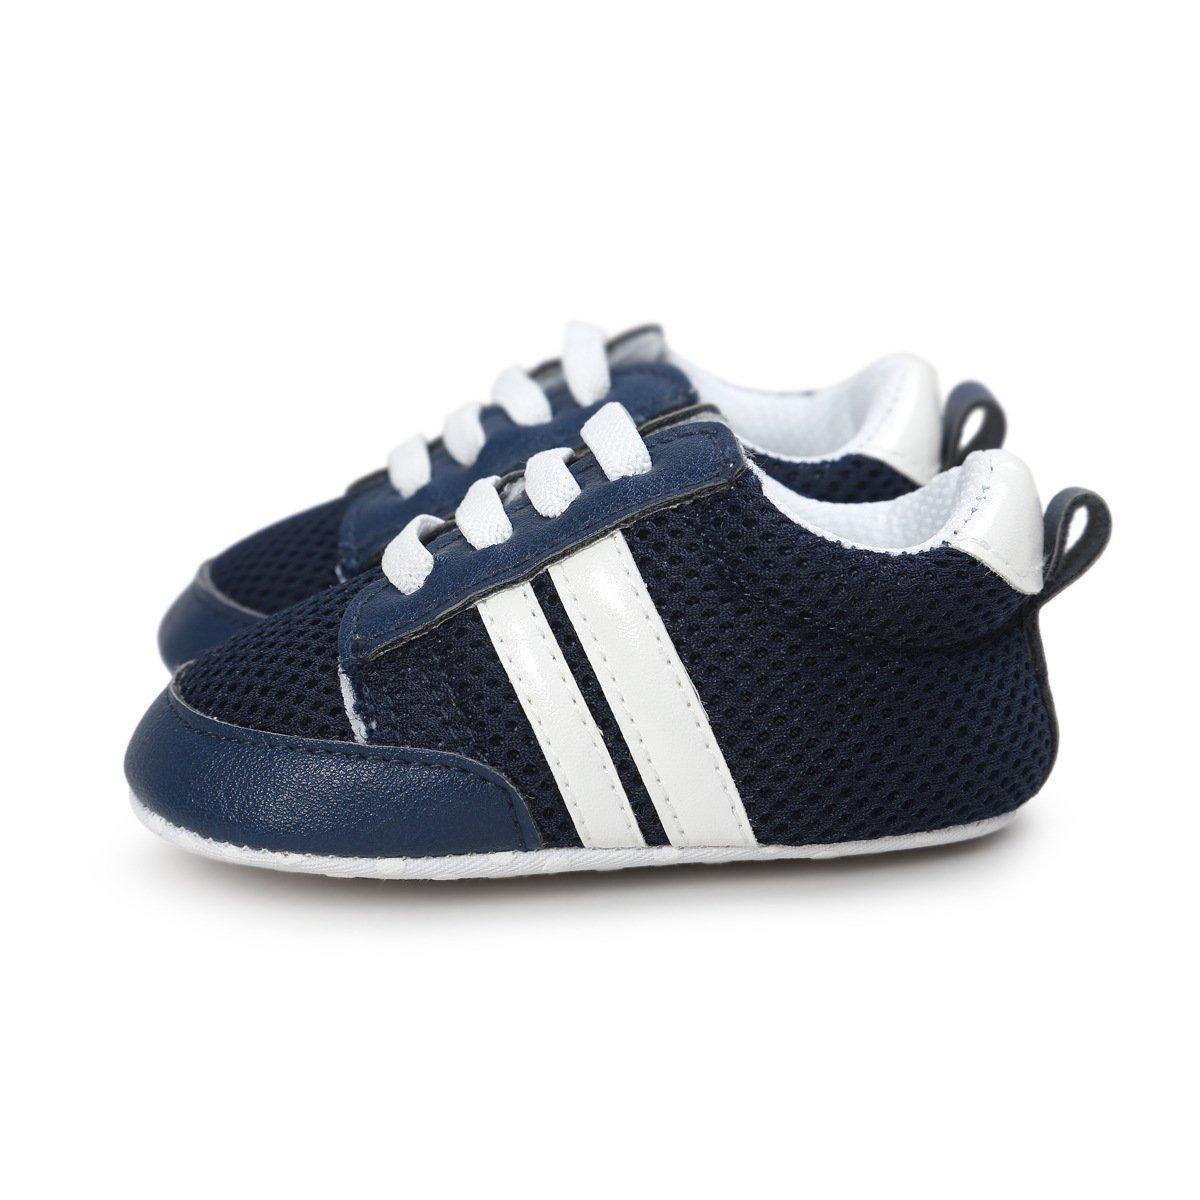 Yohuiya Baby Girls Boys Shoes Infant Prewalker Toddler Shoes Premium Soft Sole Fashion Baby Sneakers